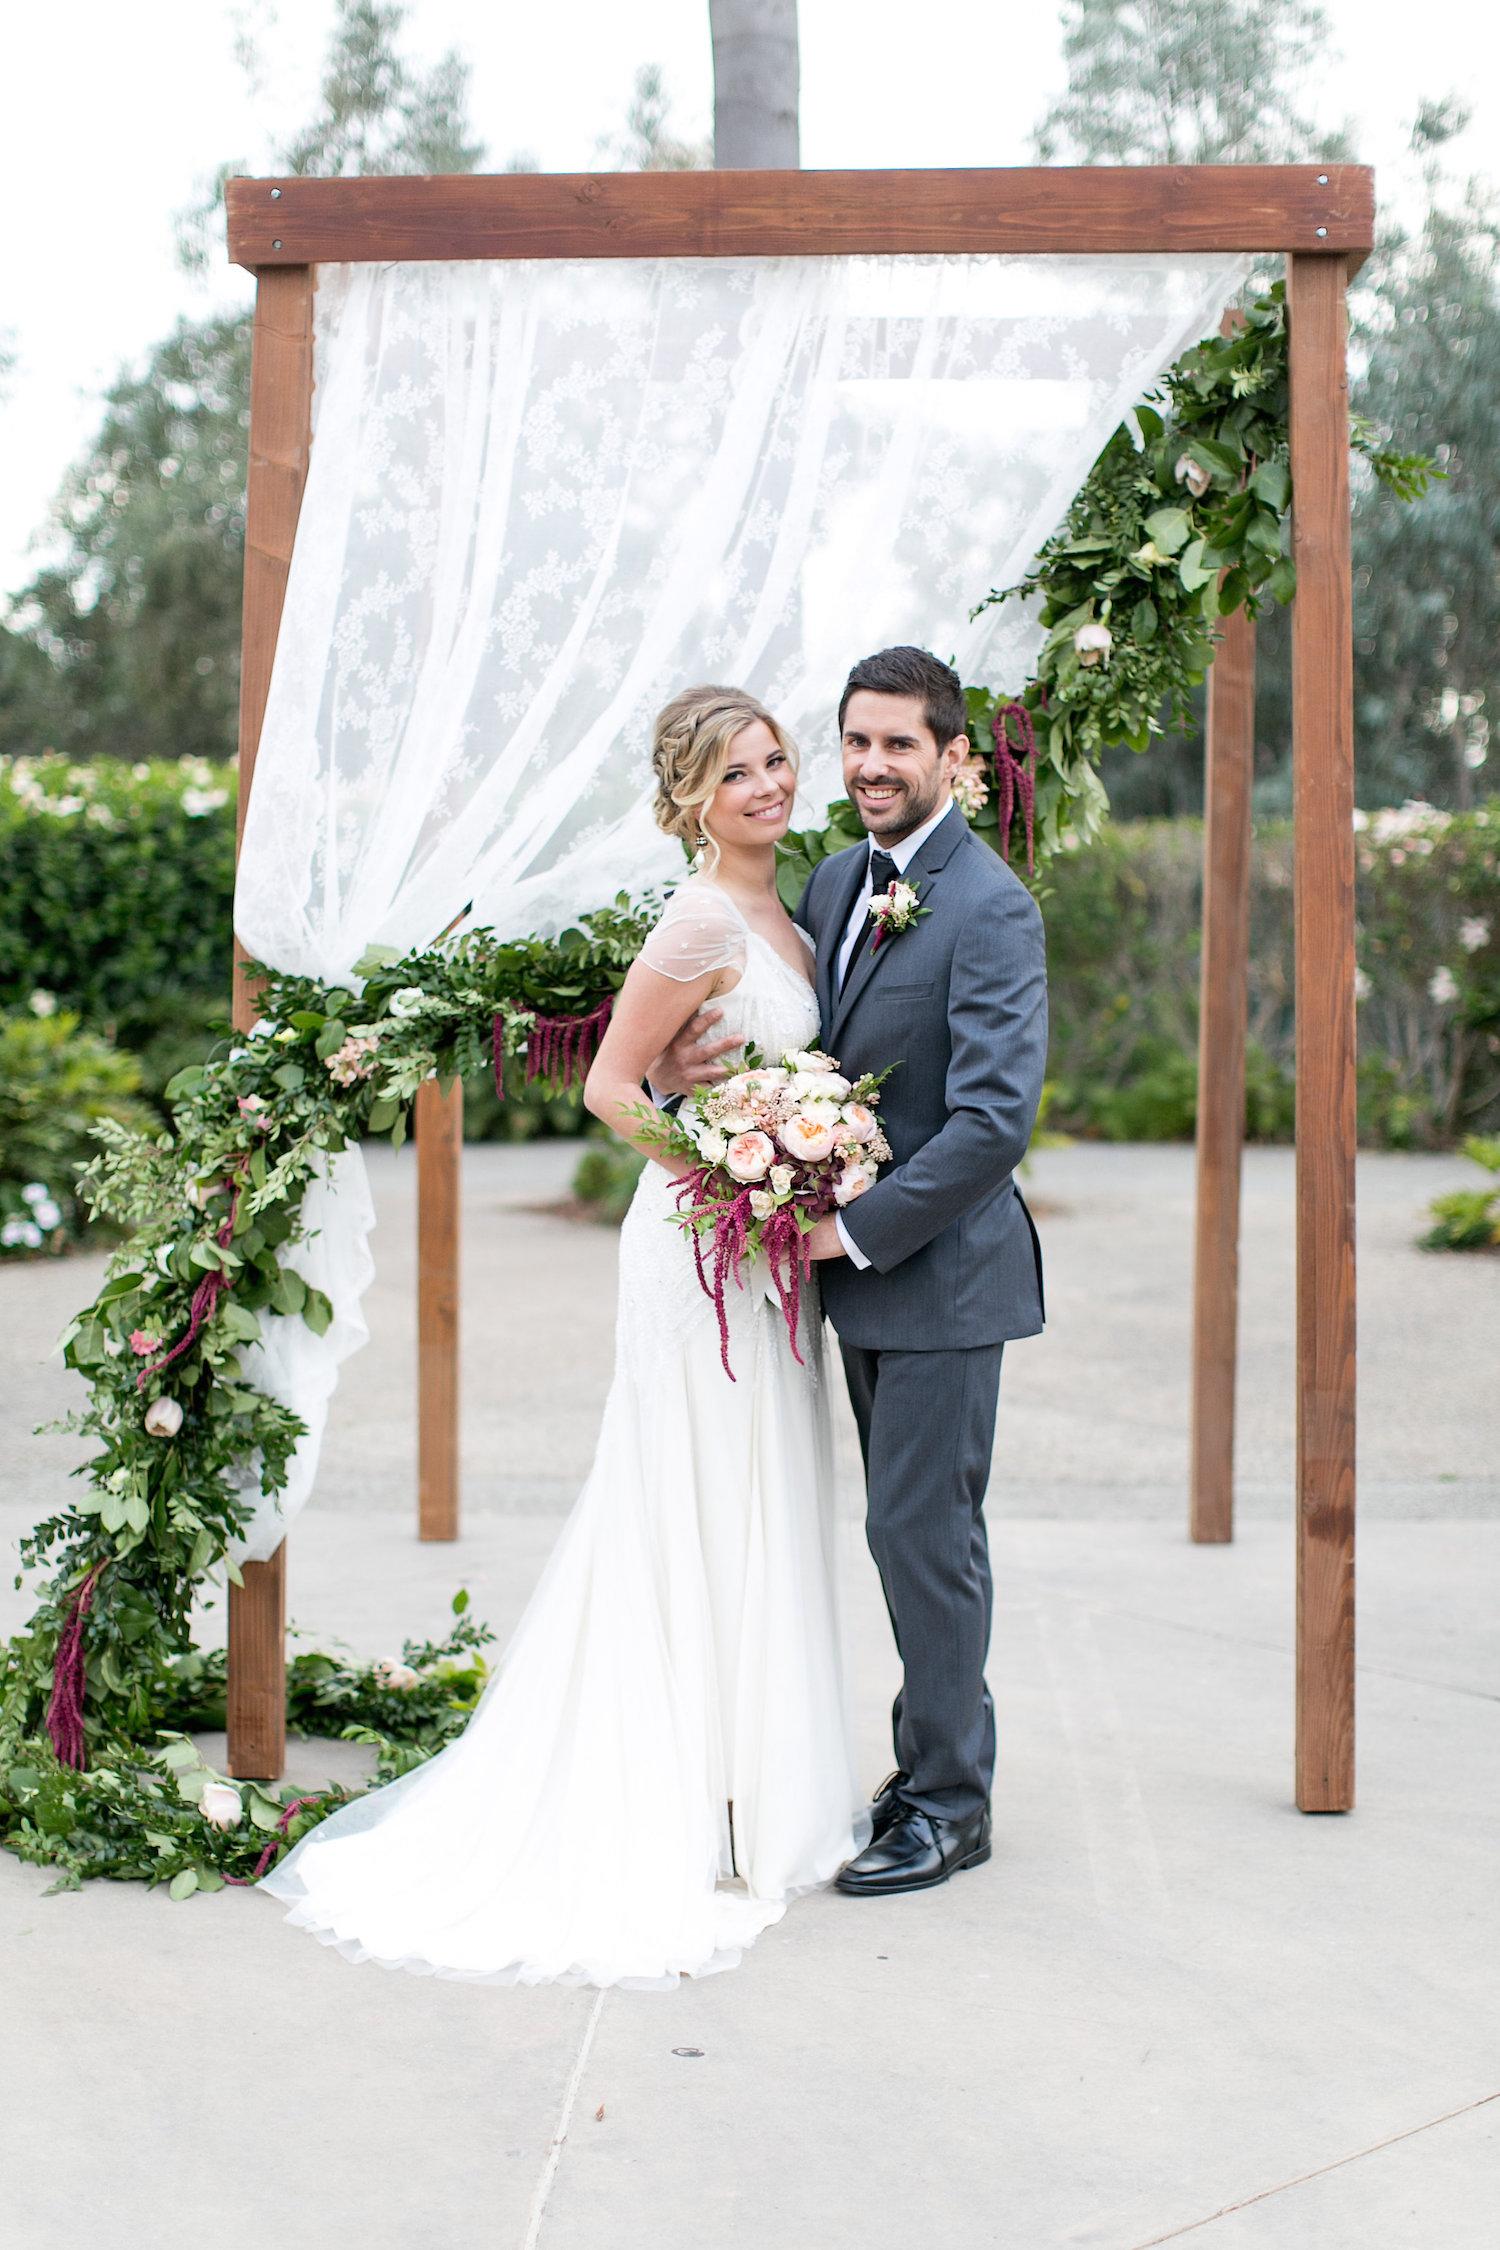 Wedding ceremony garland on chuppah by San Diego florist, Compass Floral.